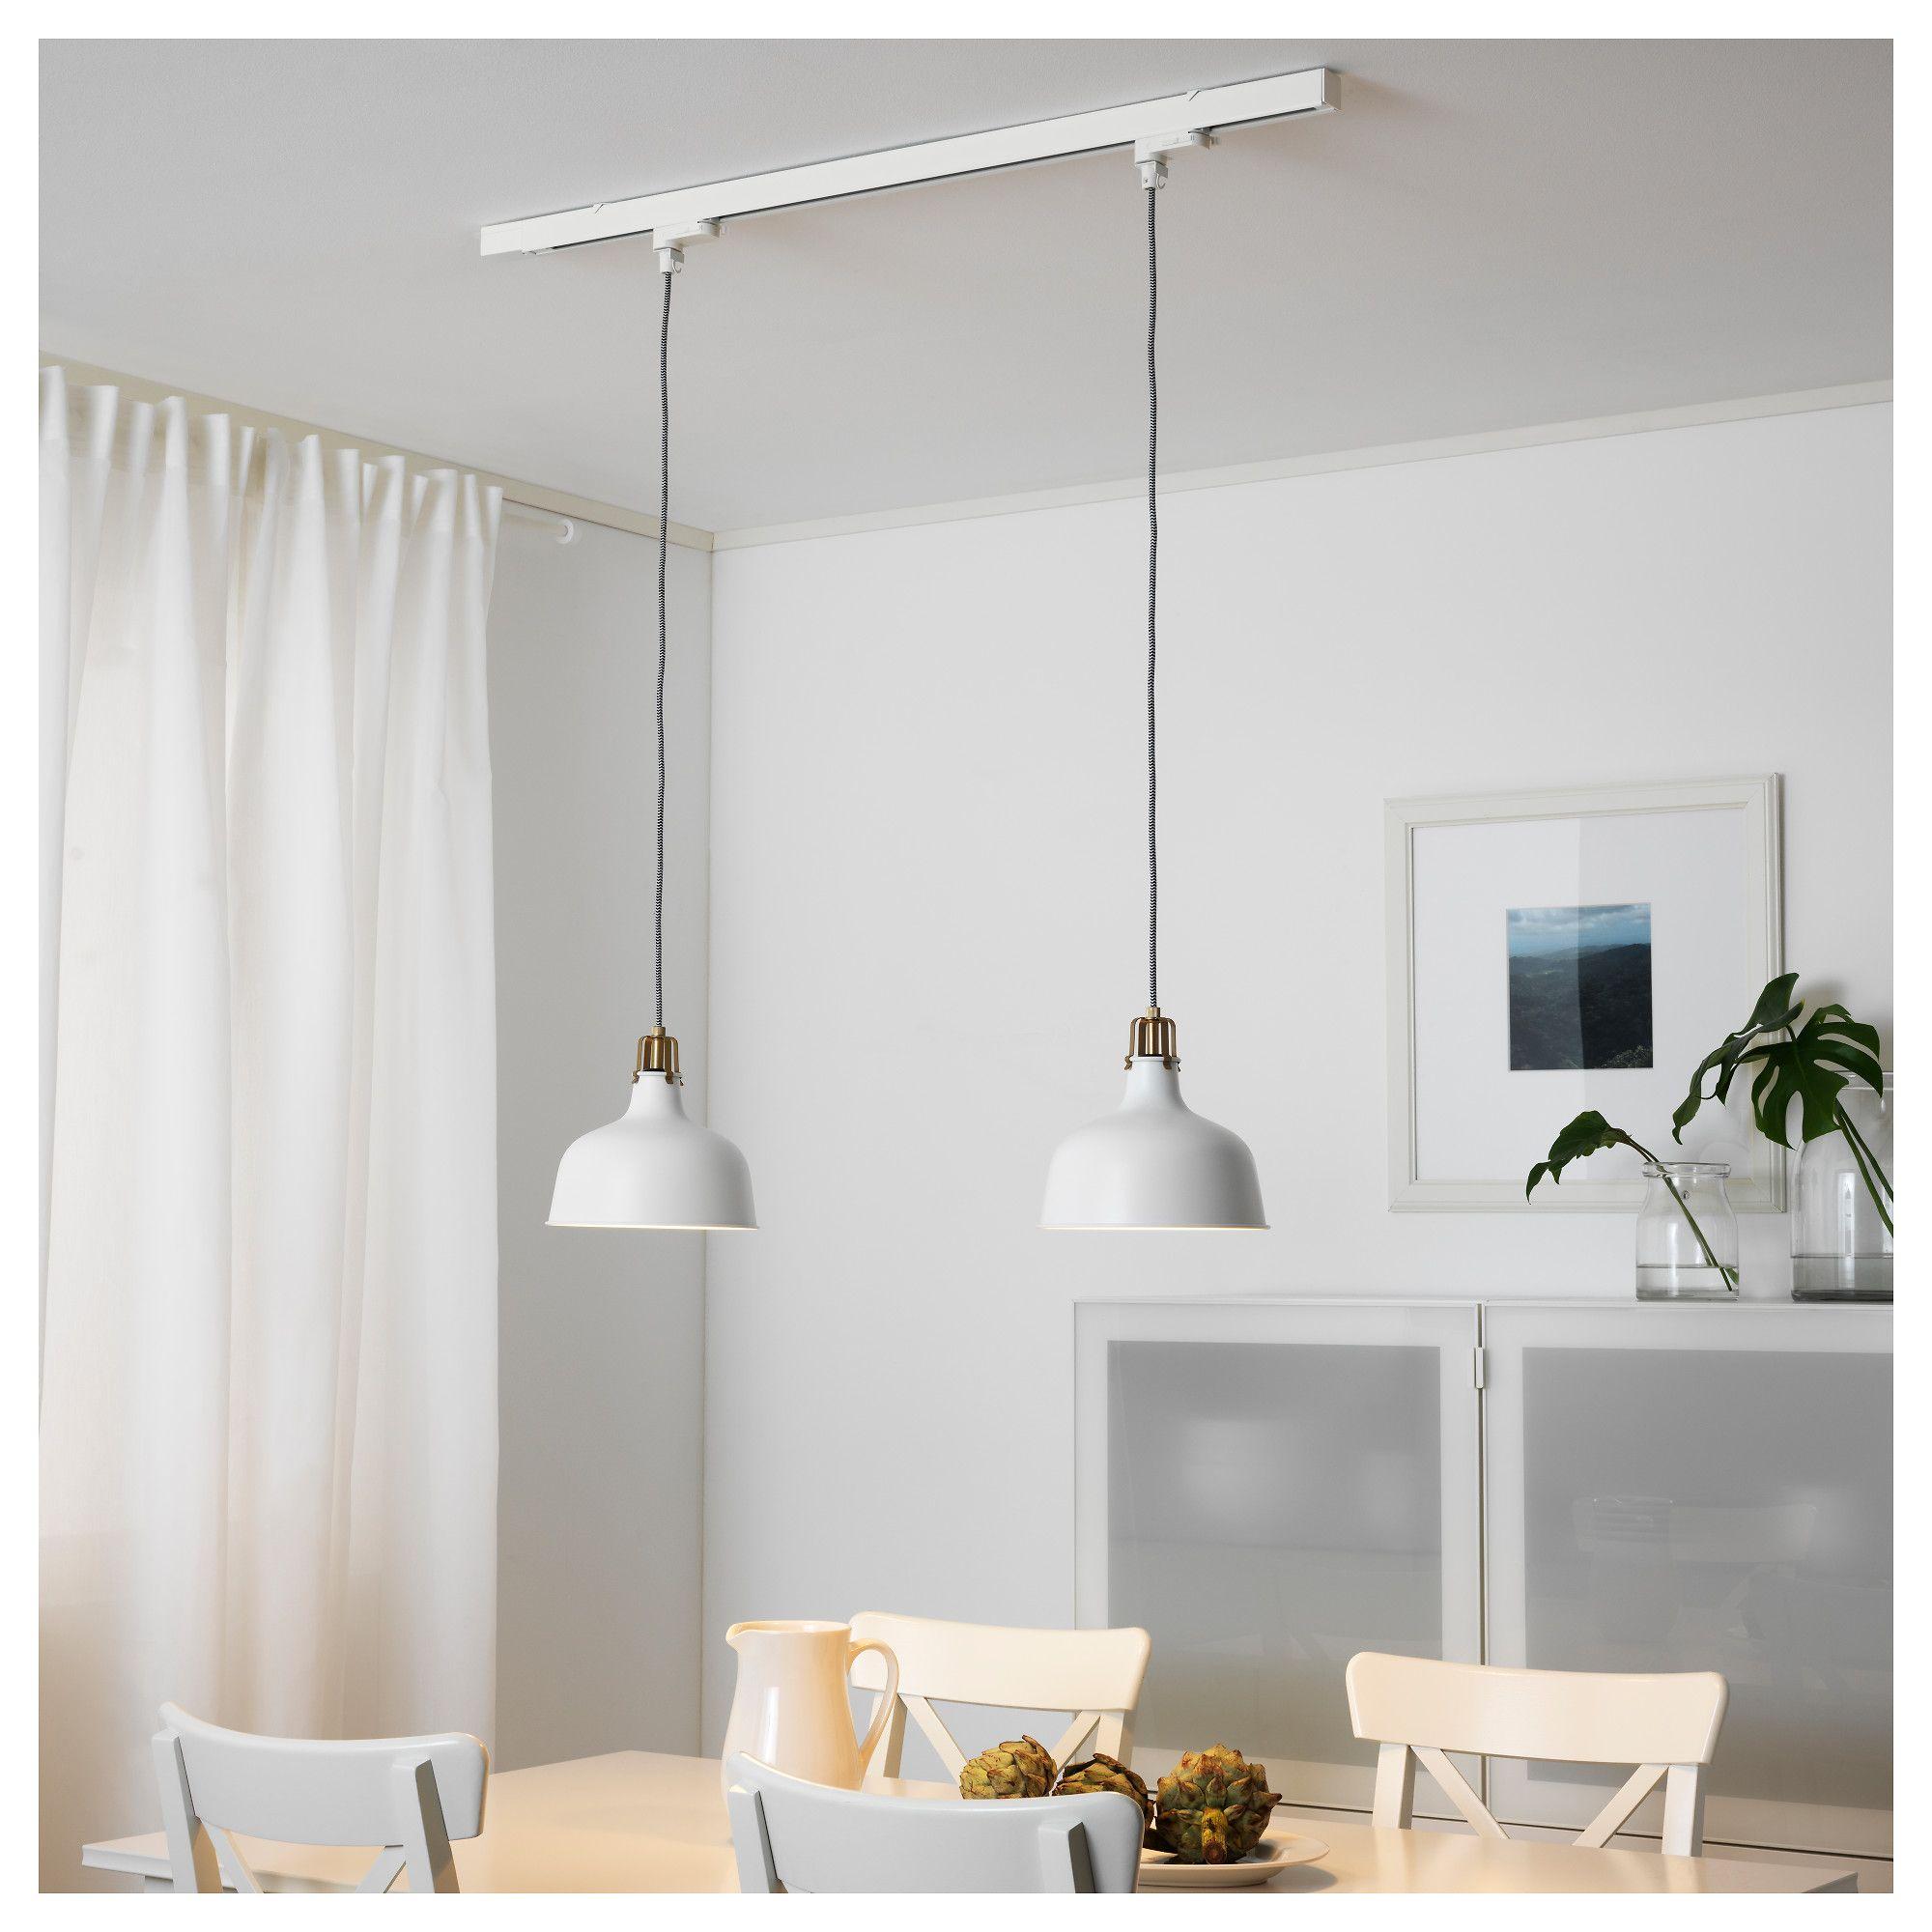 Brand New Catalogo Ikea Mesas De Cocina Recommendations - H4CK.US